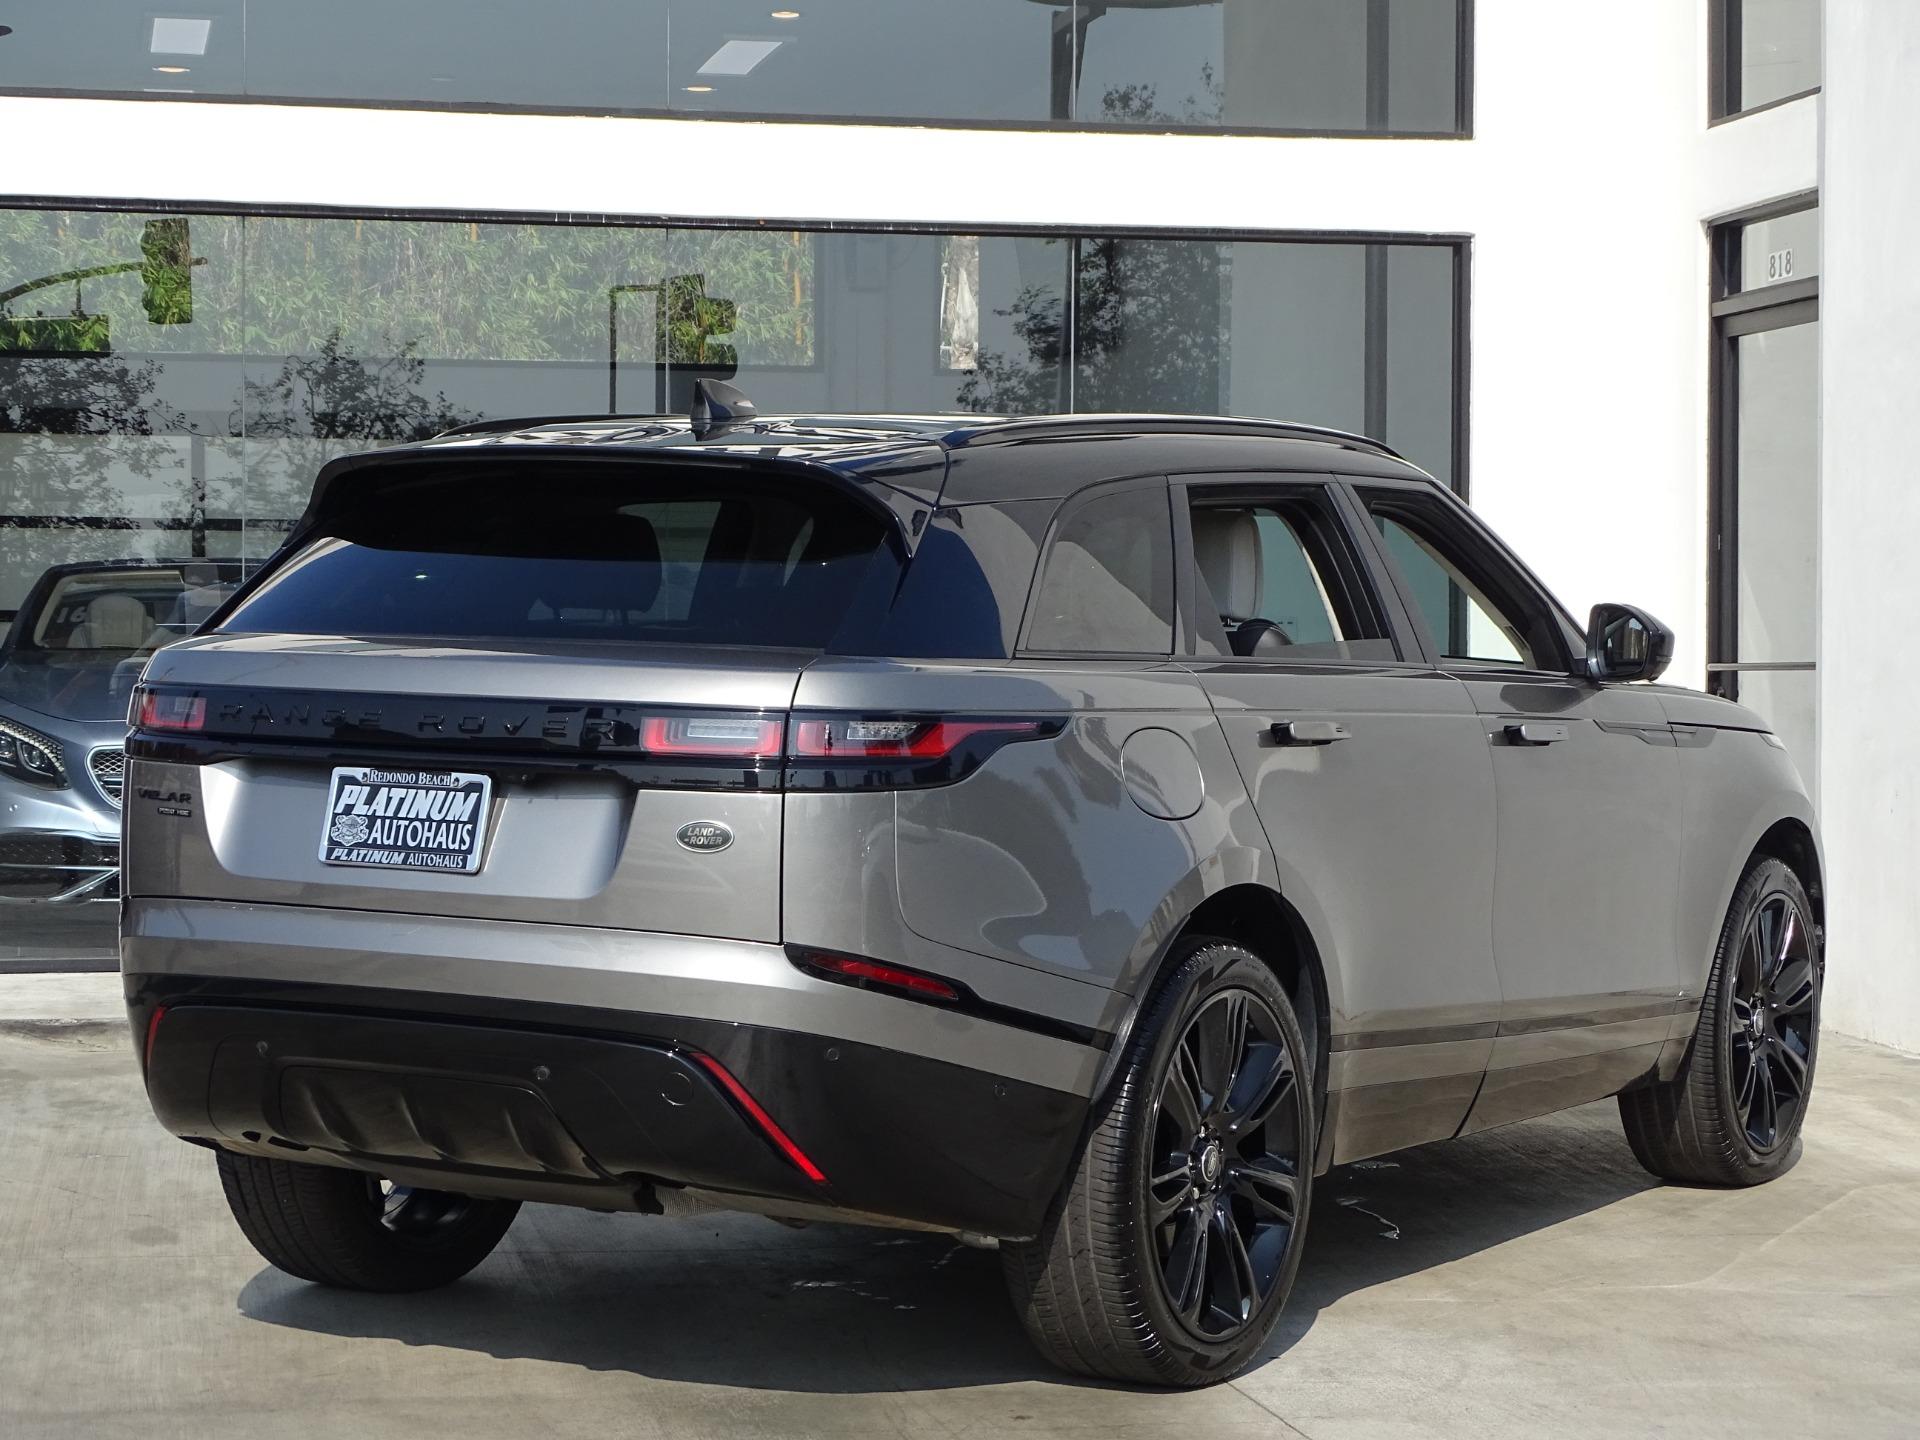 Used-2018-Land-Rover-Range-Rover-Velar-P250-R-Dynamic-HSE